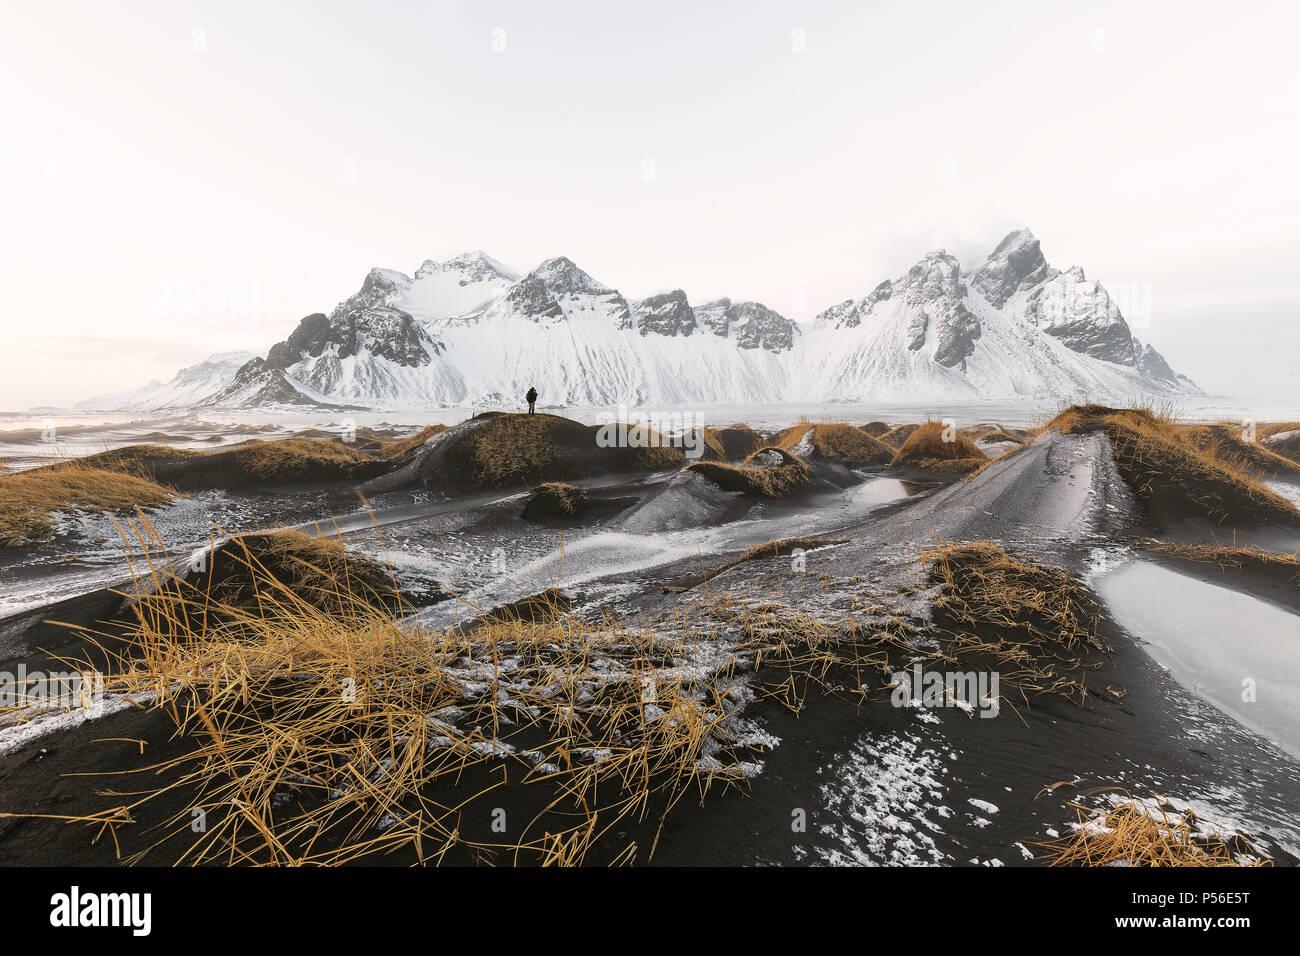 Vestrahorn mountains at Stokksnes beach in Iceland - Stock Image